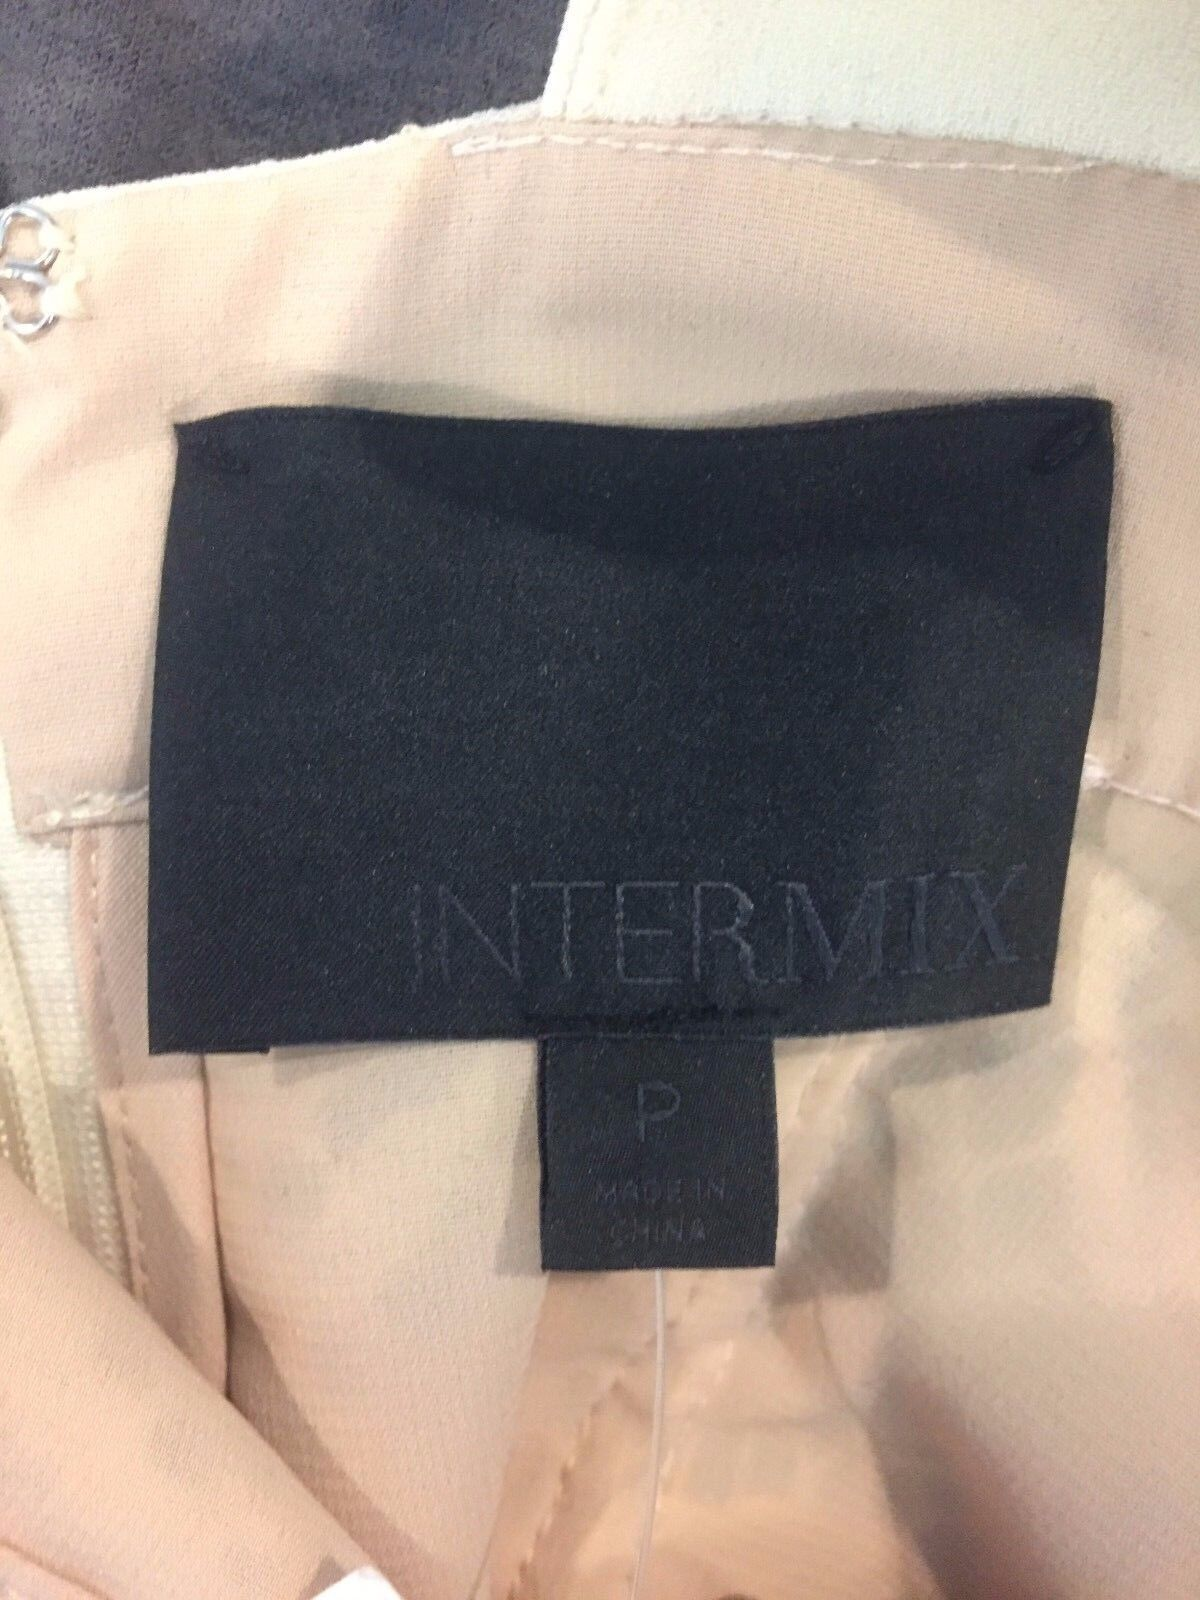 INTERMIX 10317 NWT  450 EXCLUSIVE TO INTERMIX IVORY IVORY IVORY LACE BRIANA DRESS SZ P 3e0460